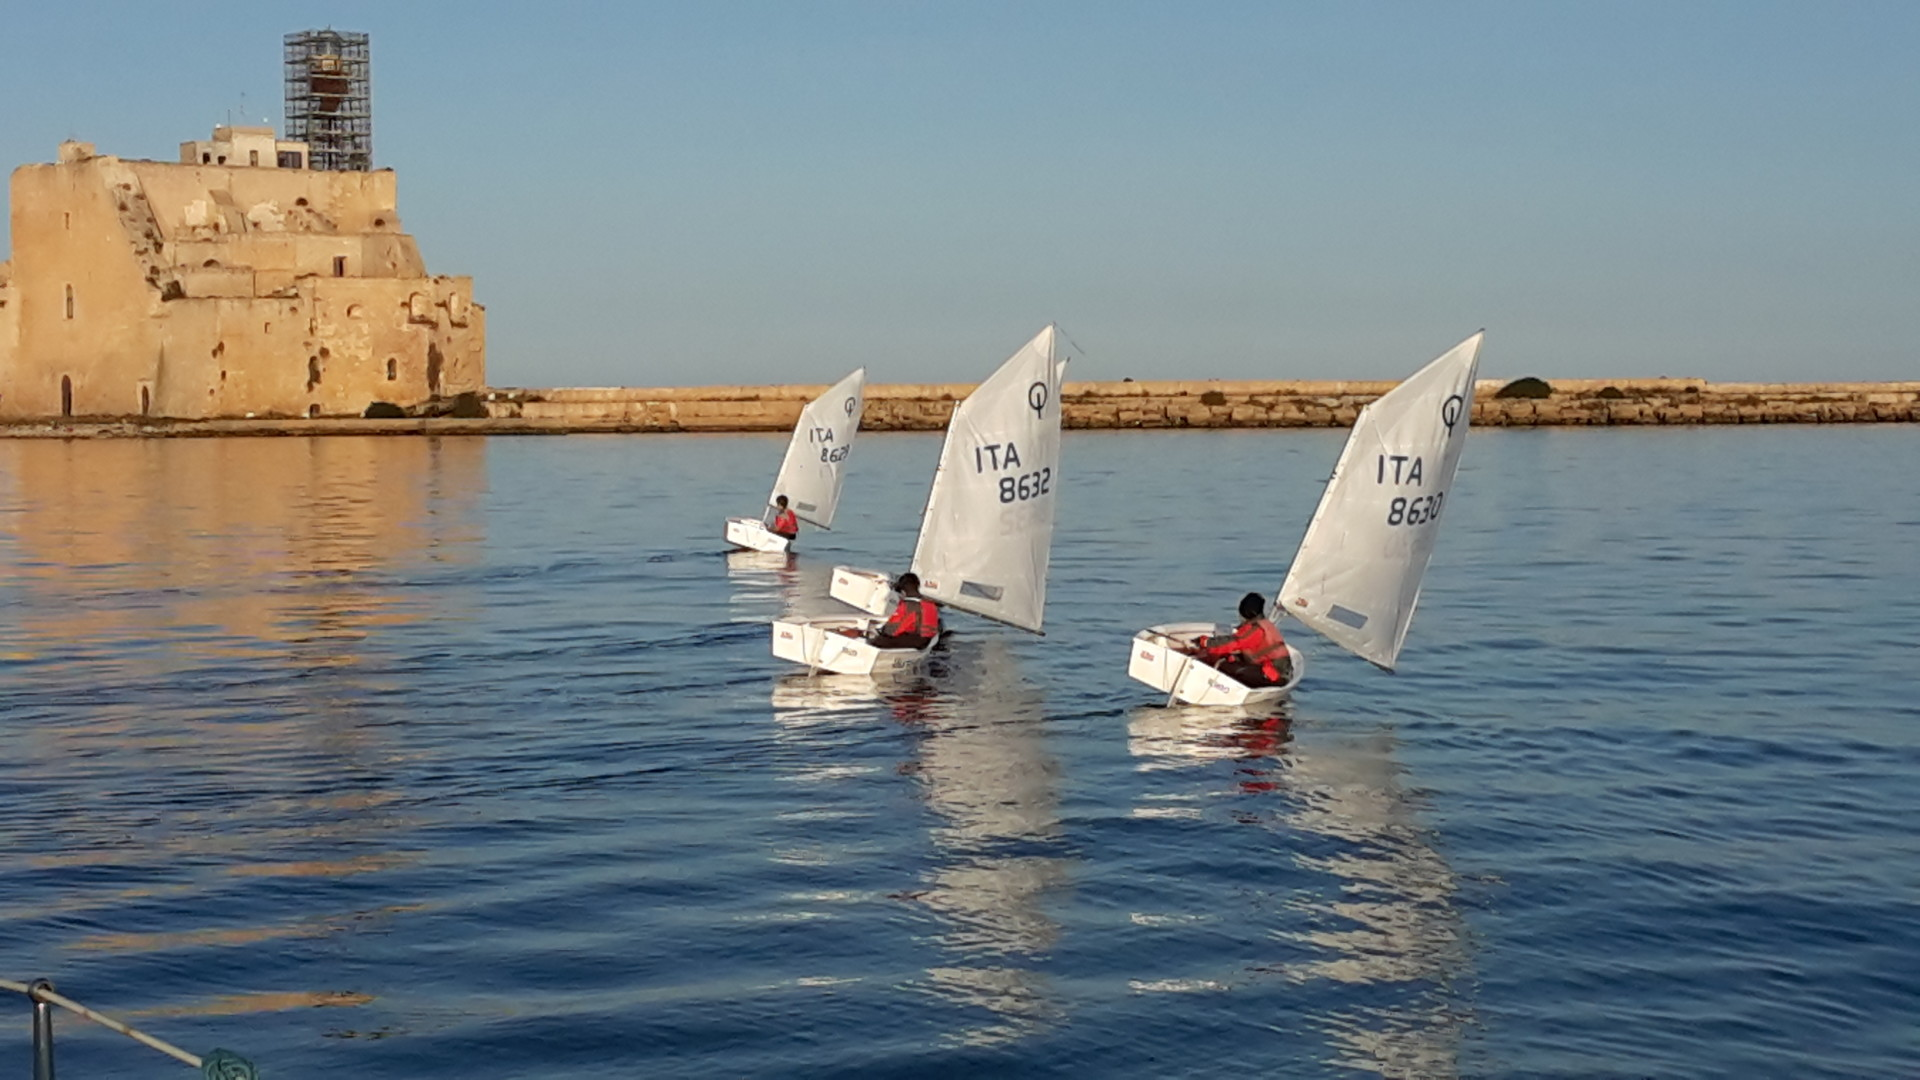 Scuola-di-vela-lega-navale-LNI-Brindisi (7)